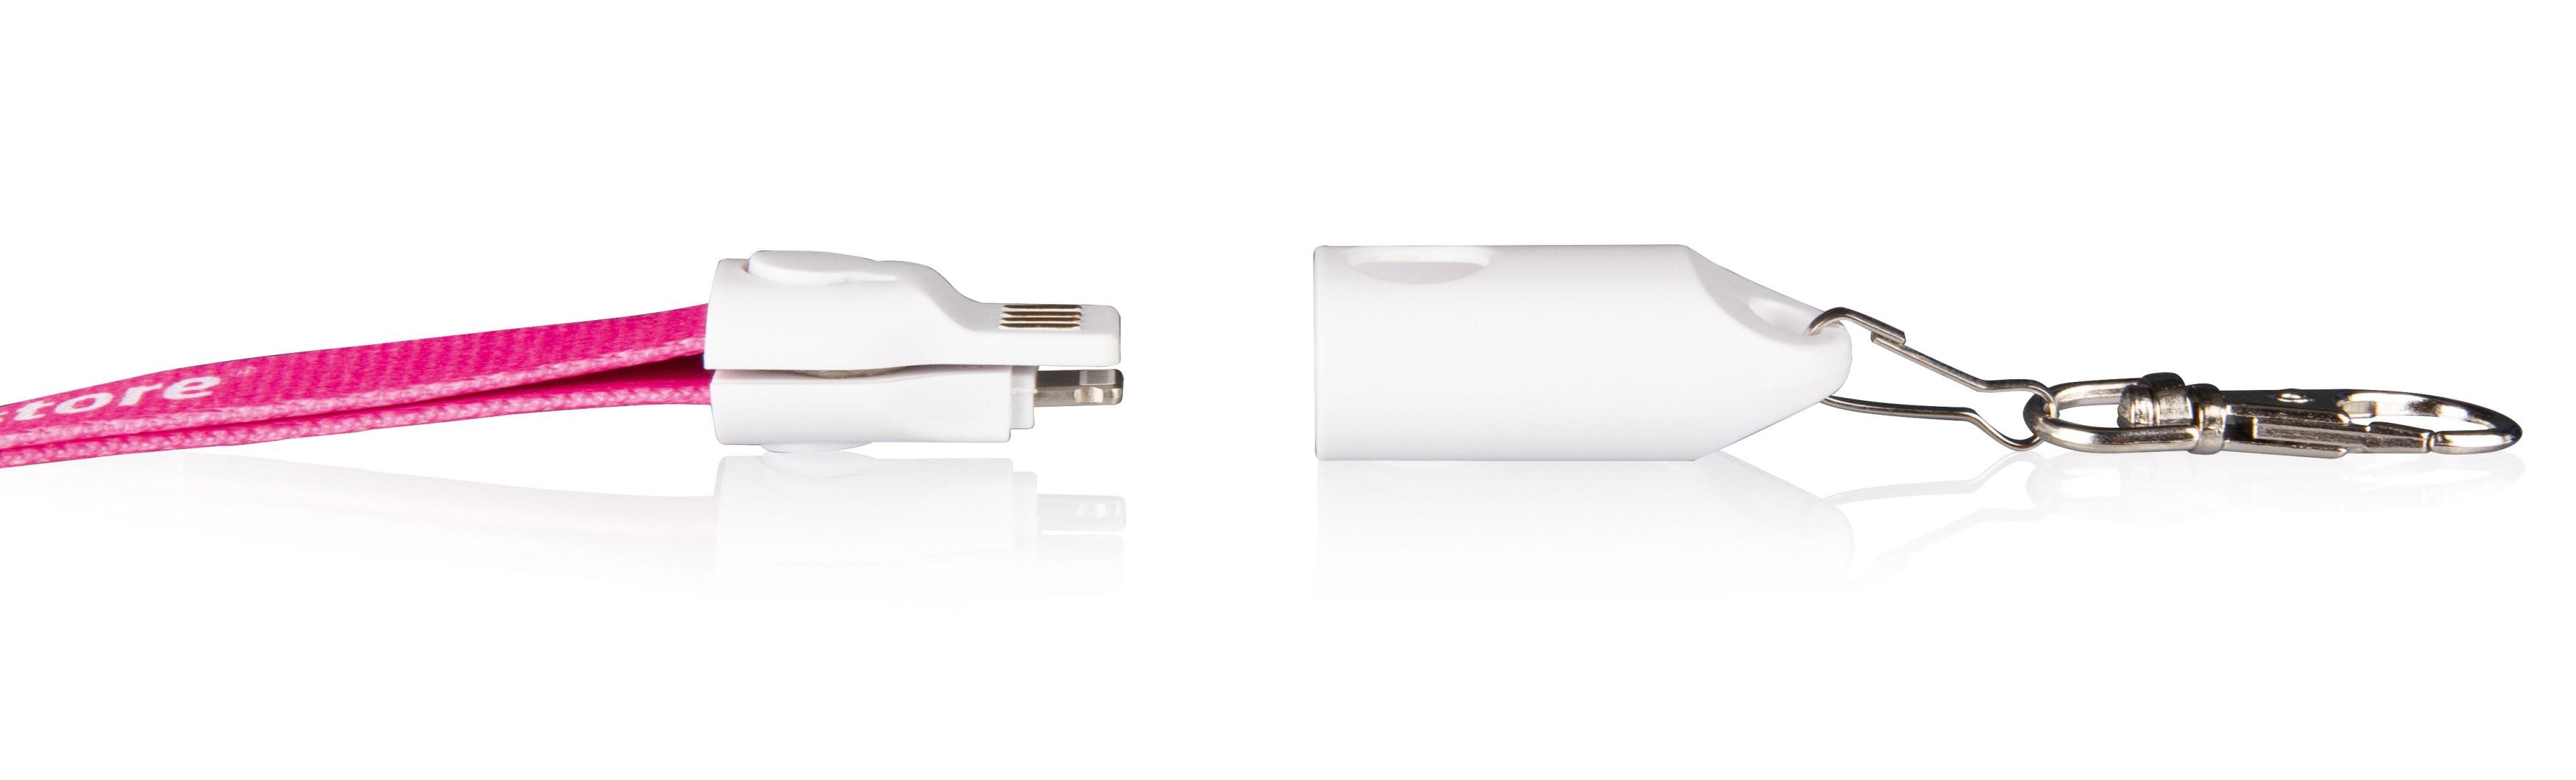 2-in-1 USB-Lanyard, Ansicht 2